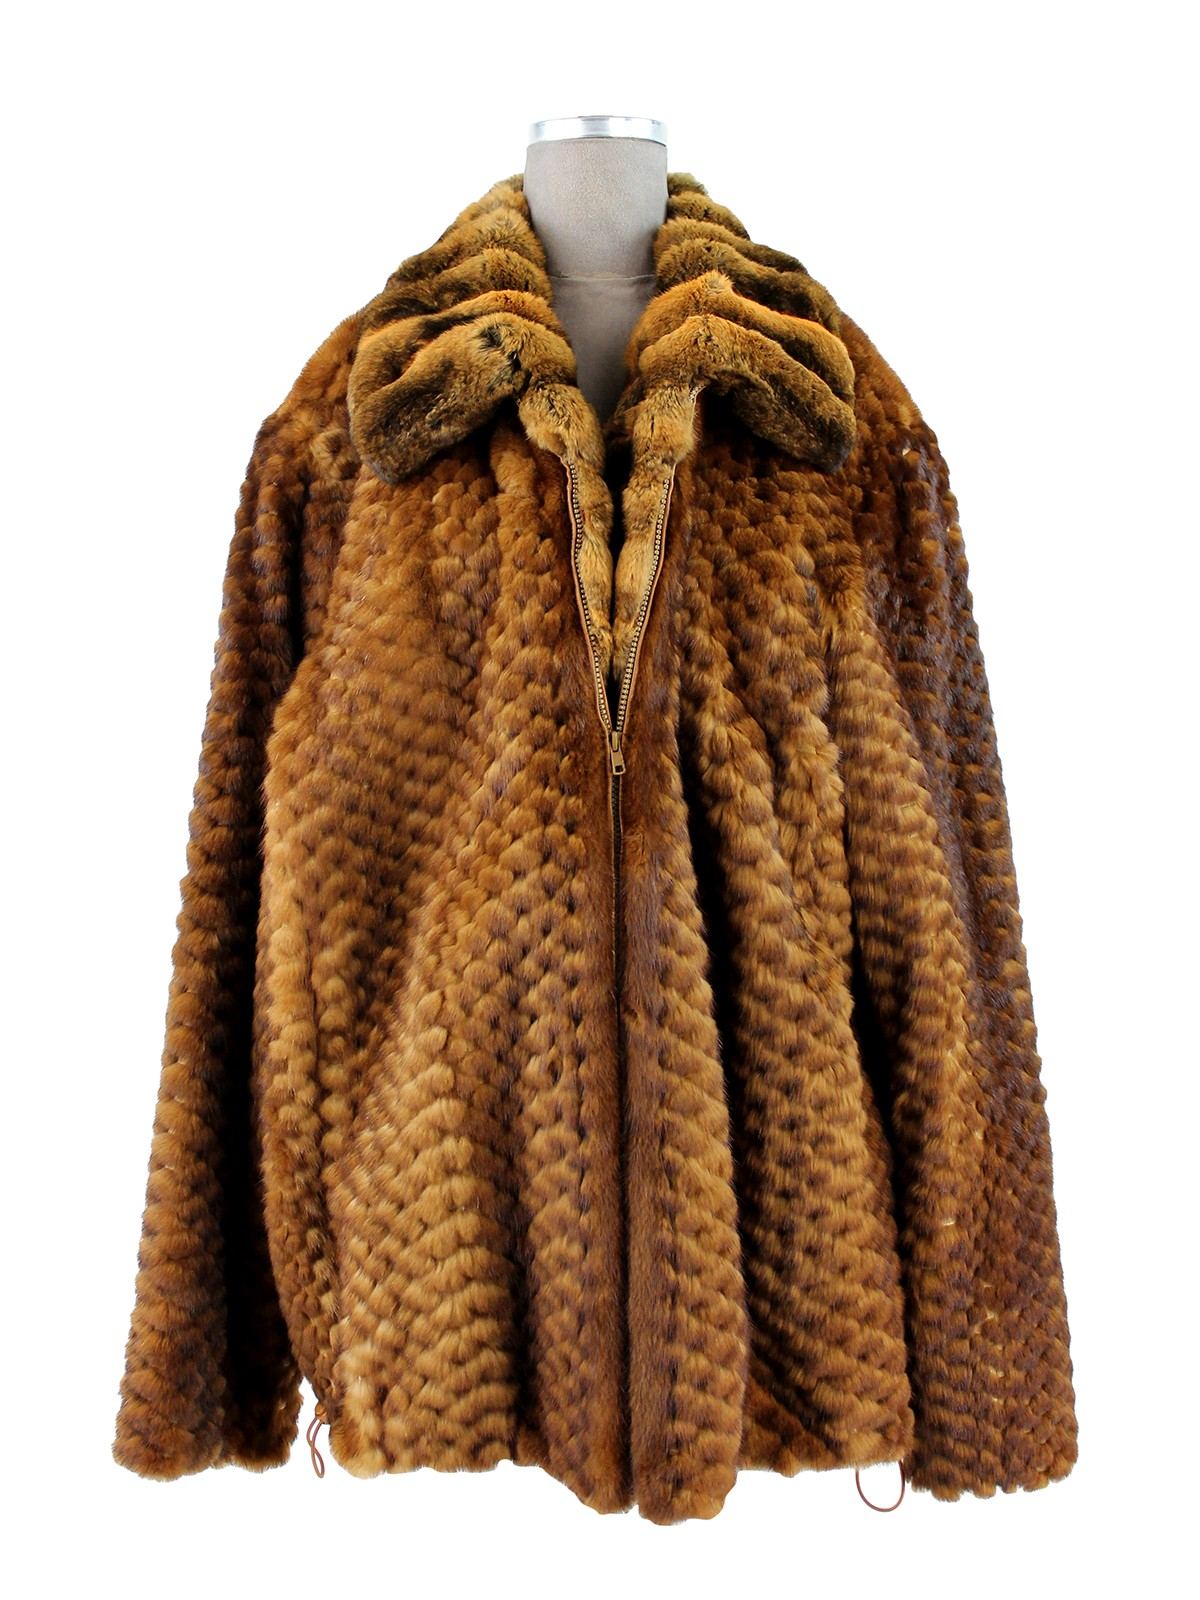 Man's Whiskey Mink Fur Jacket with Chinchilla Collar